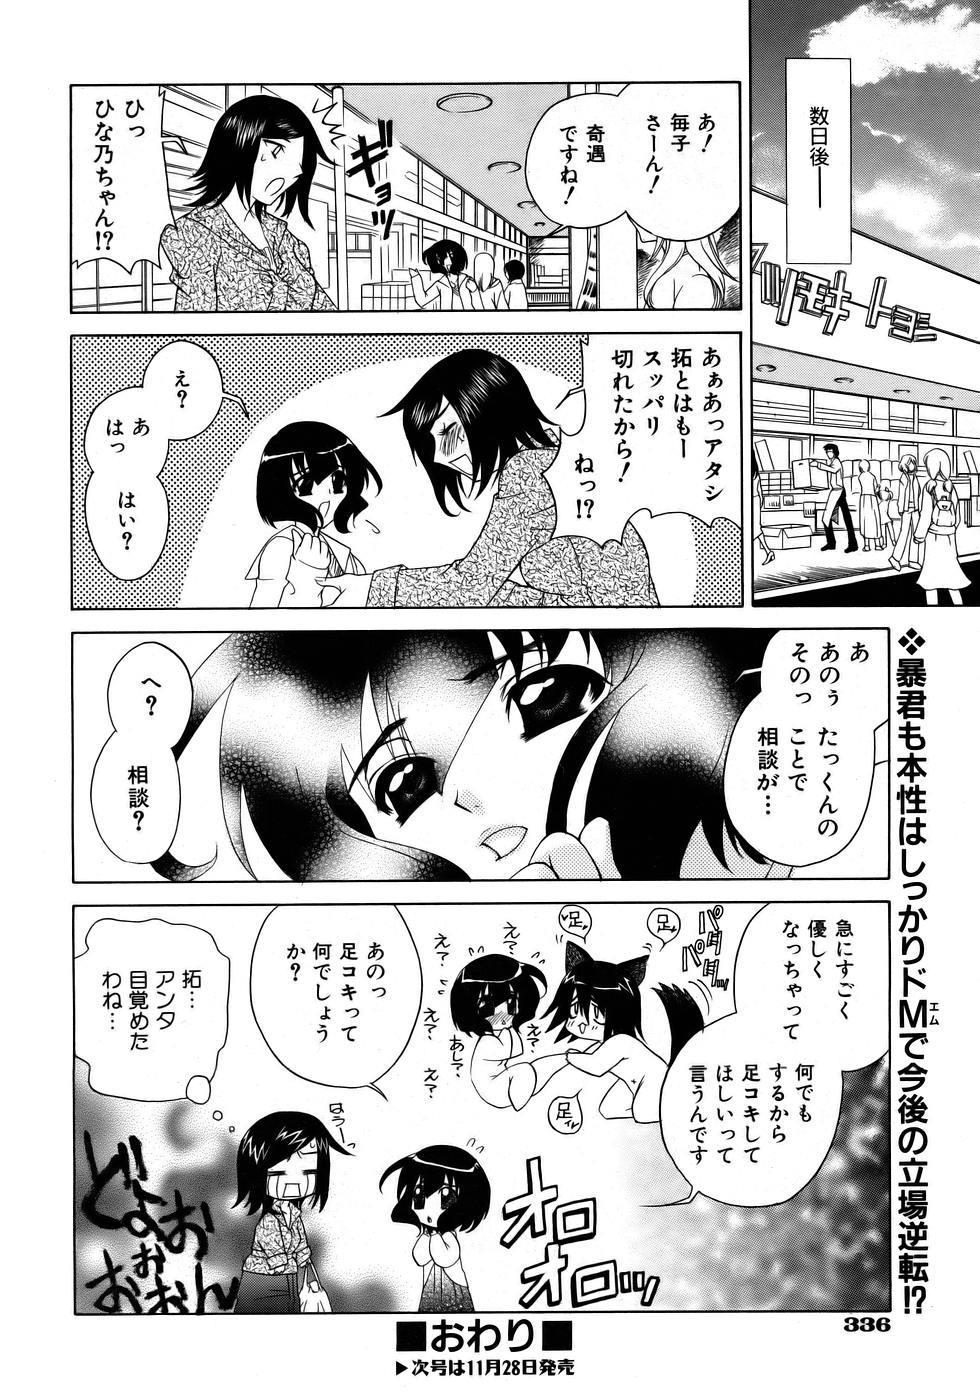 COMIC AUN 2005-12 Vol. 115 333